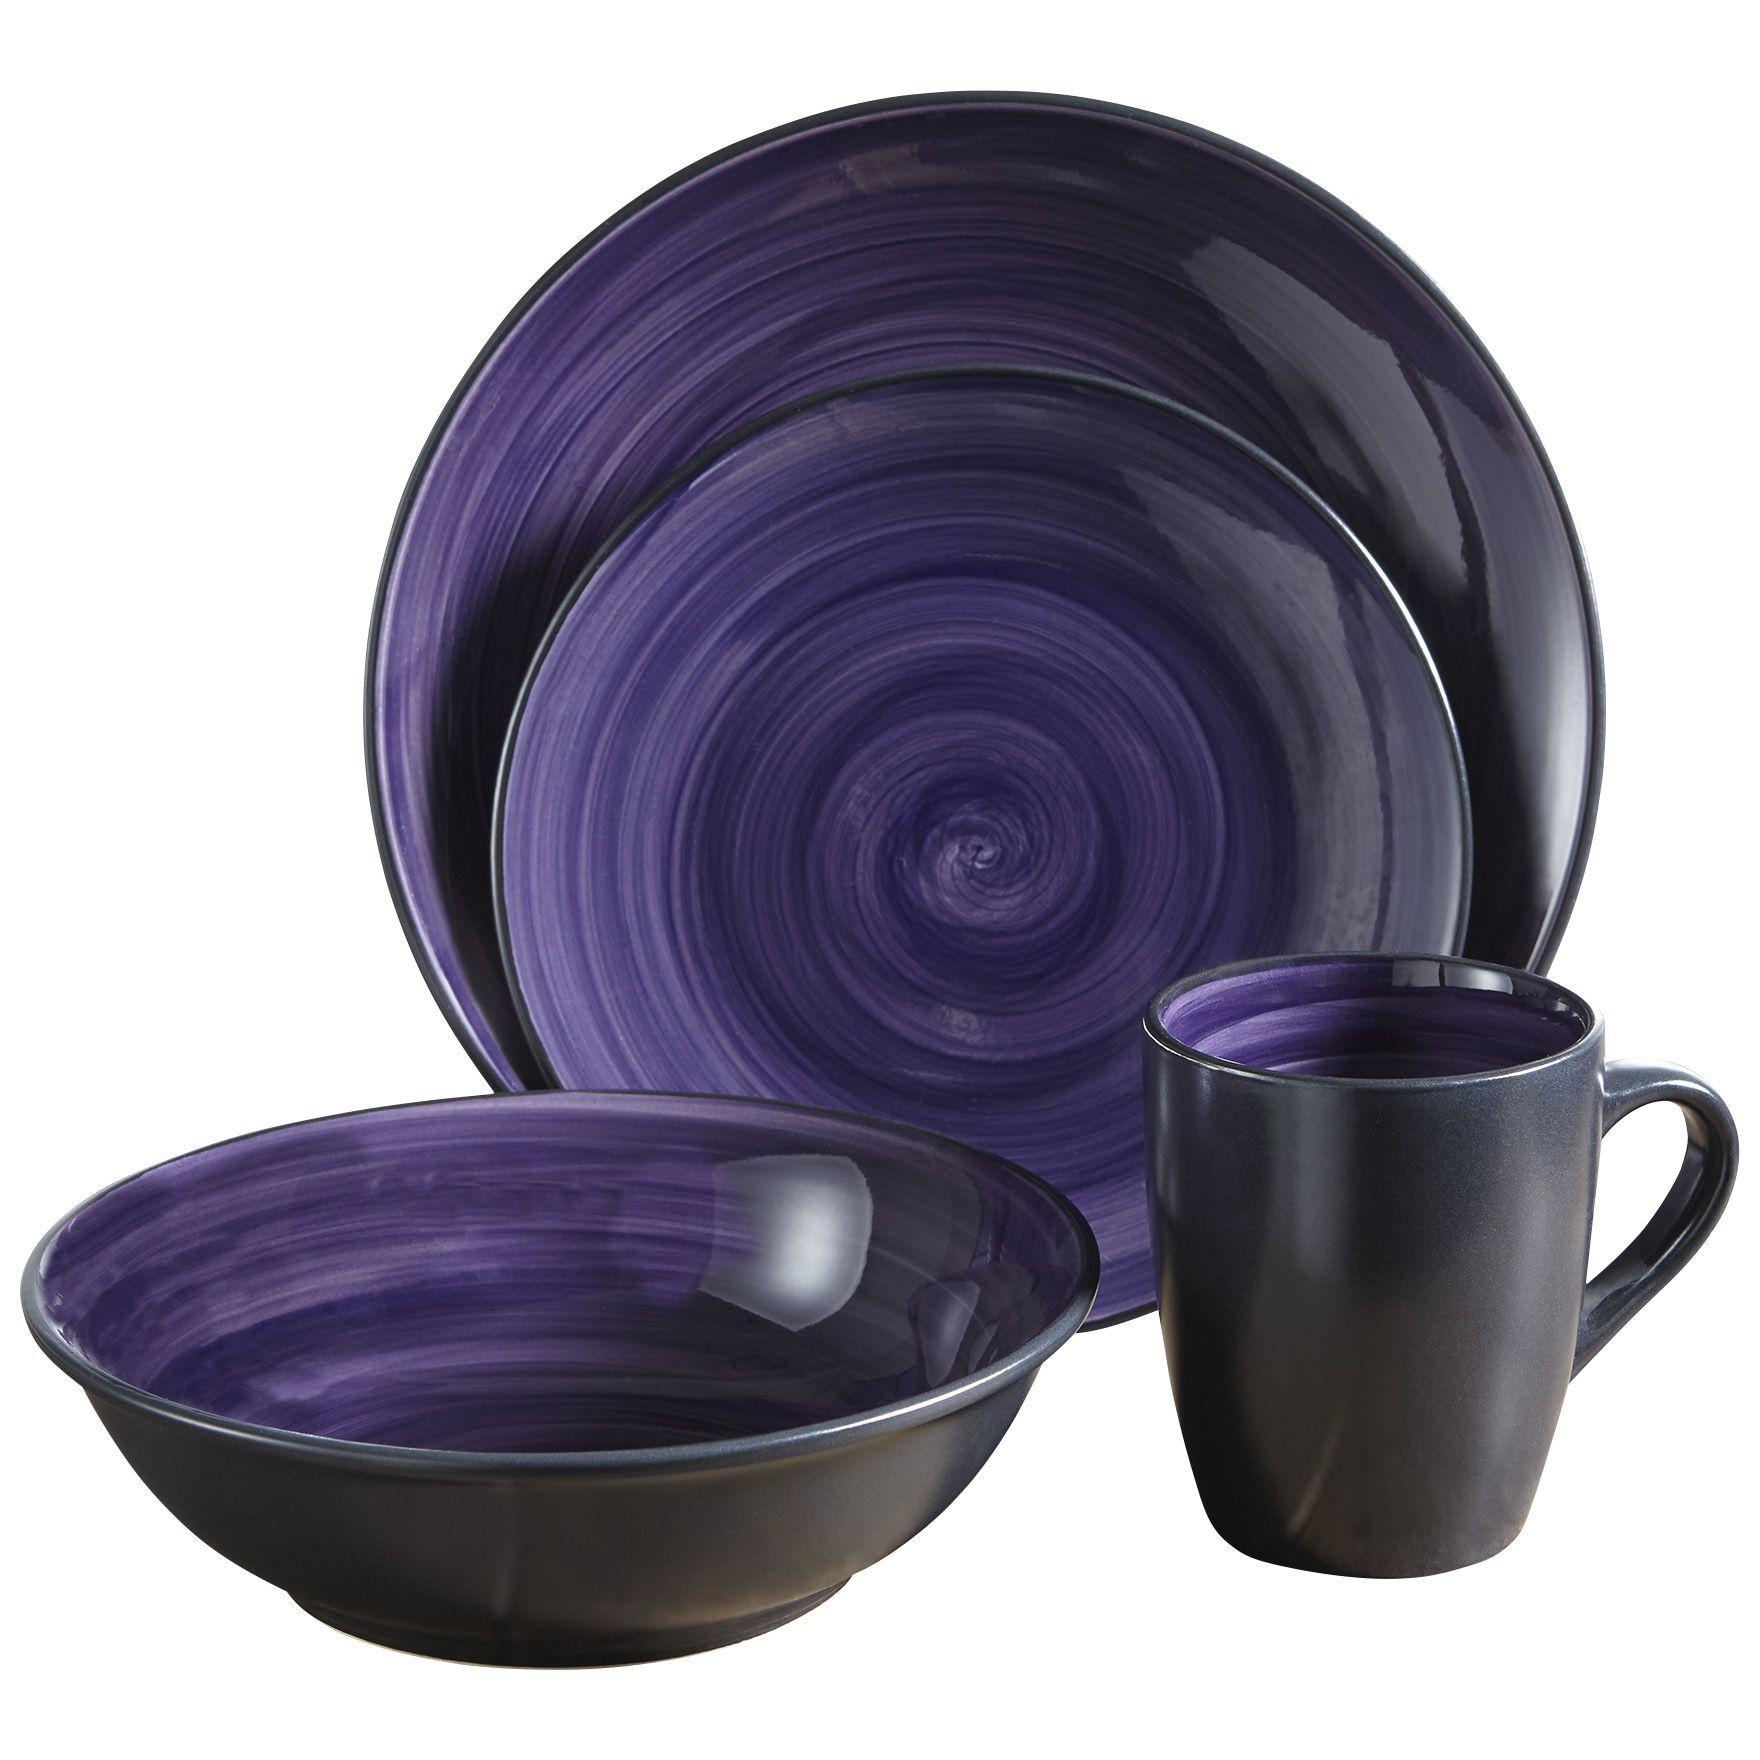 Fingerhut - McLeland Design 16-Pc. Stoneware Dinnerware Set - Purple/Black  sc 1 st  Pinterest & Fingerhut - McLeland Design 16-Pc. Stoneware Dinnerware Set - Purple ...